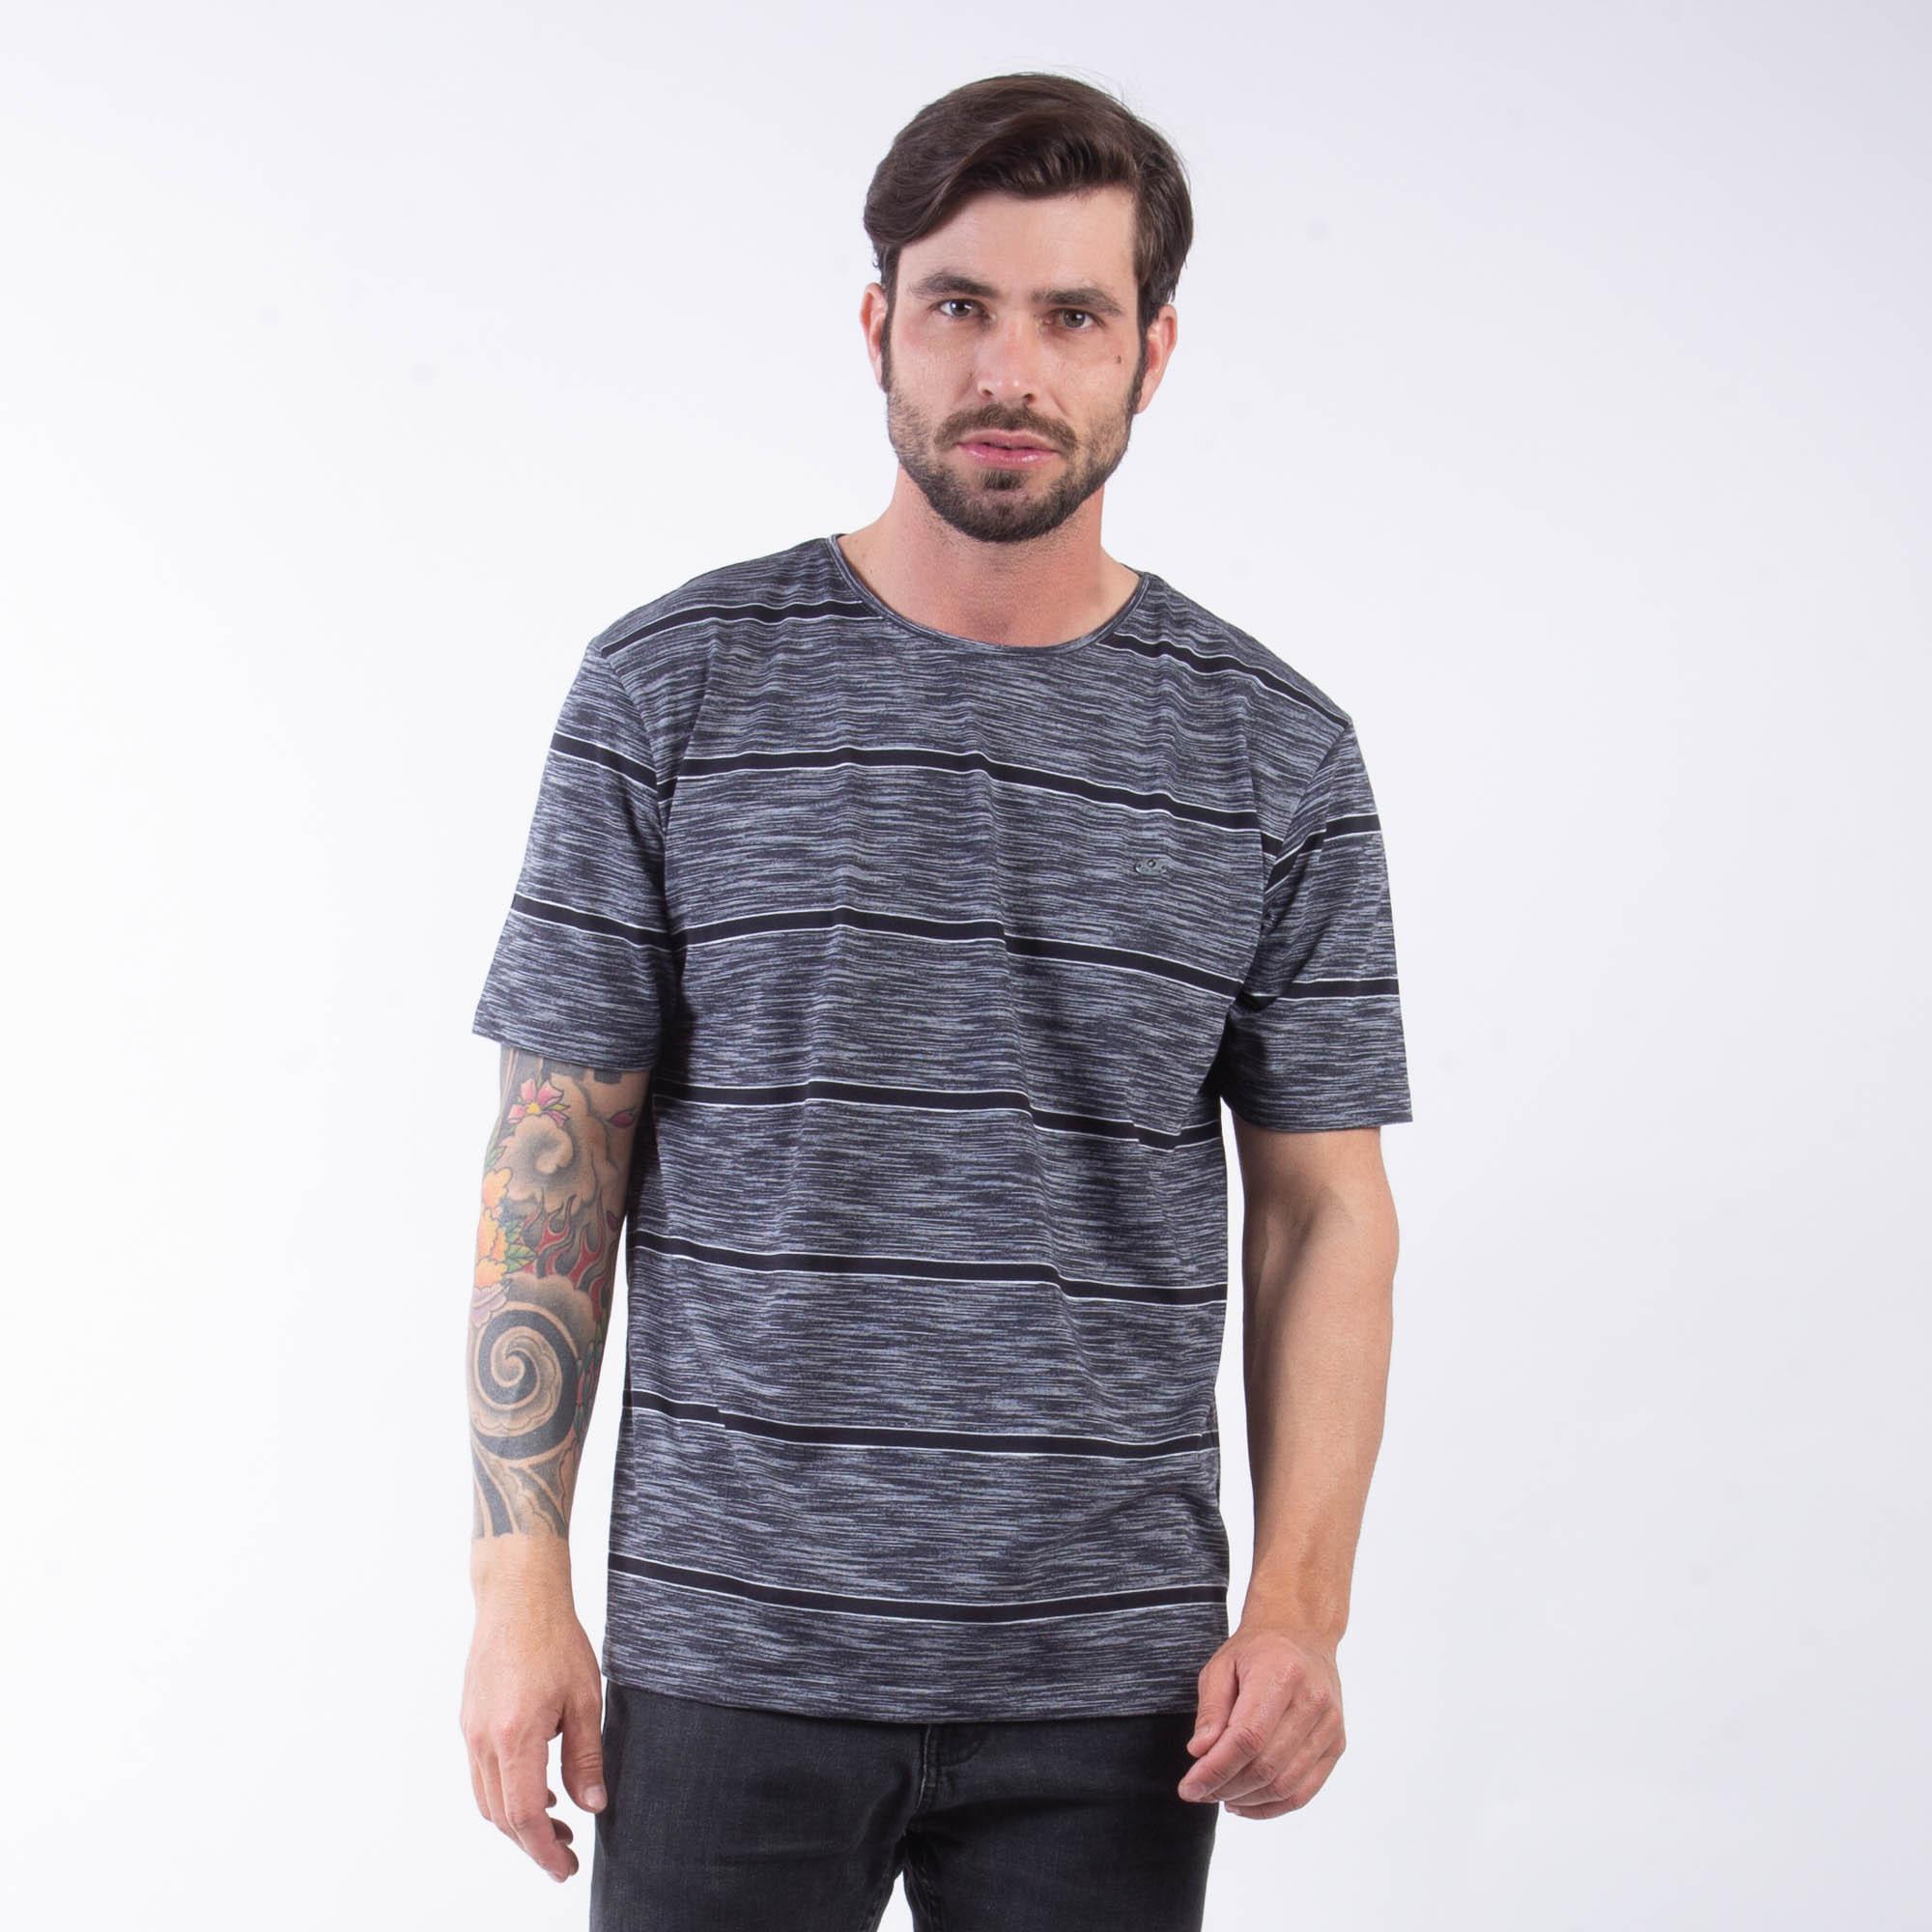 Camiseta Masculina Cinza E Preta